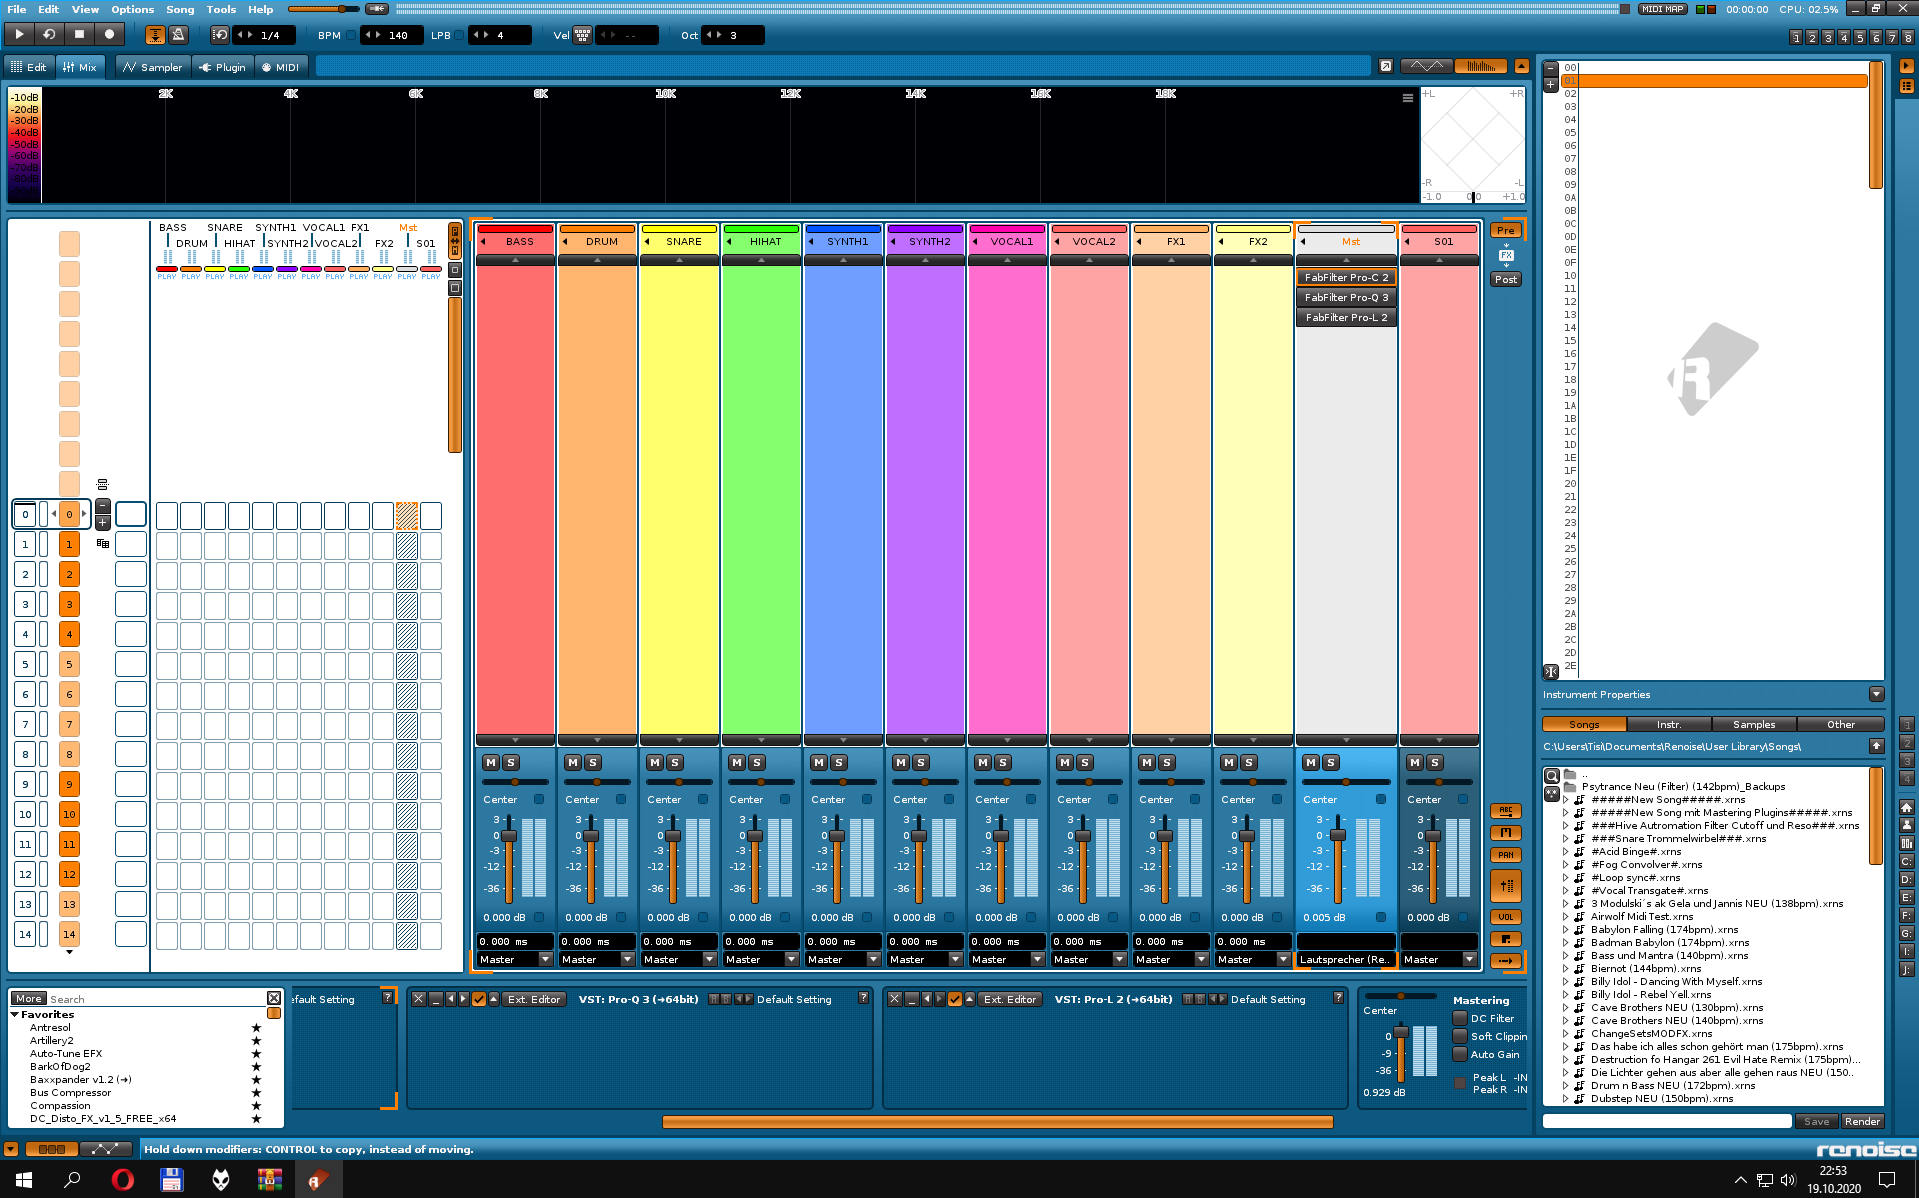 Screenshot - 19.10.2020 , 22_54_06